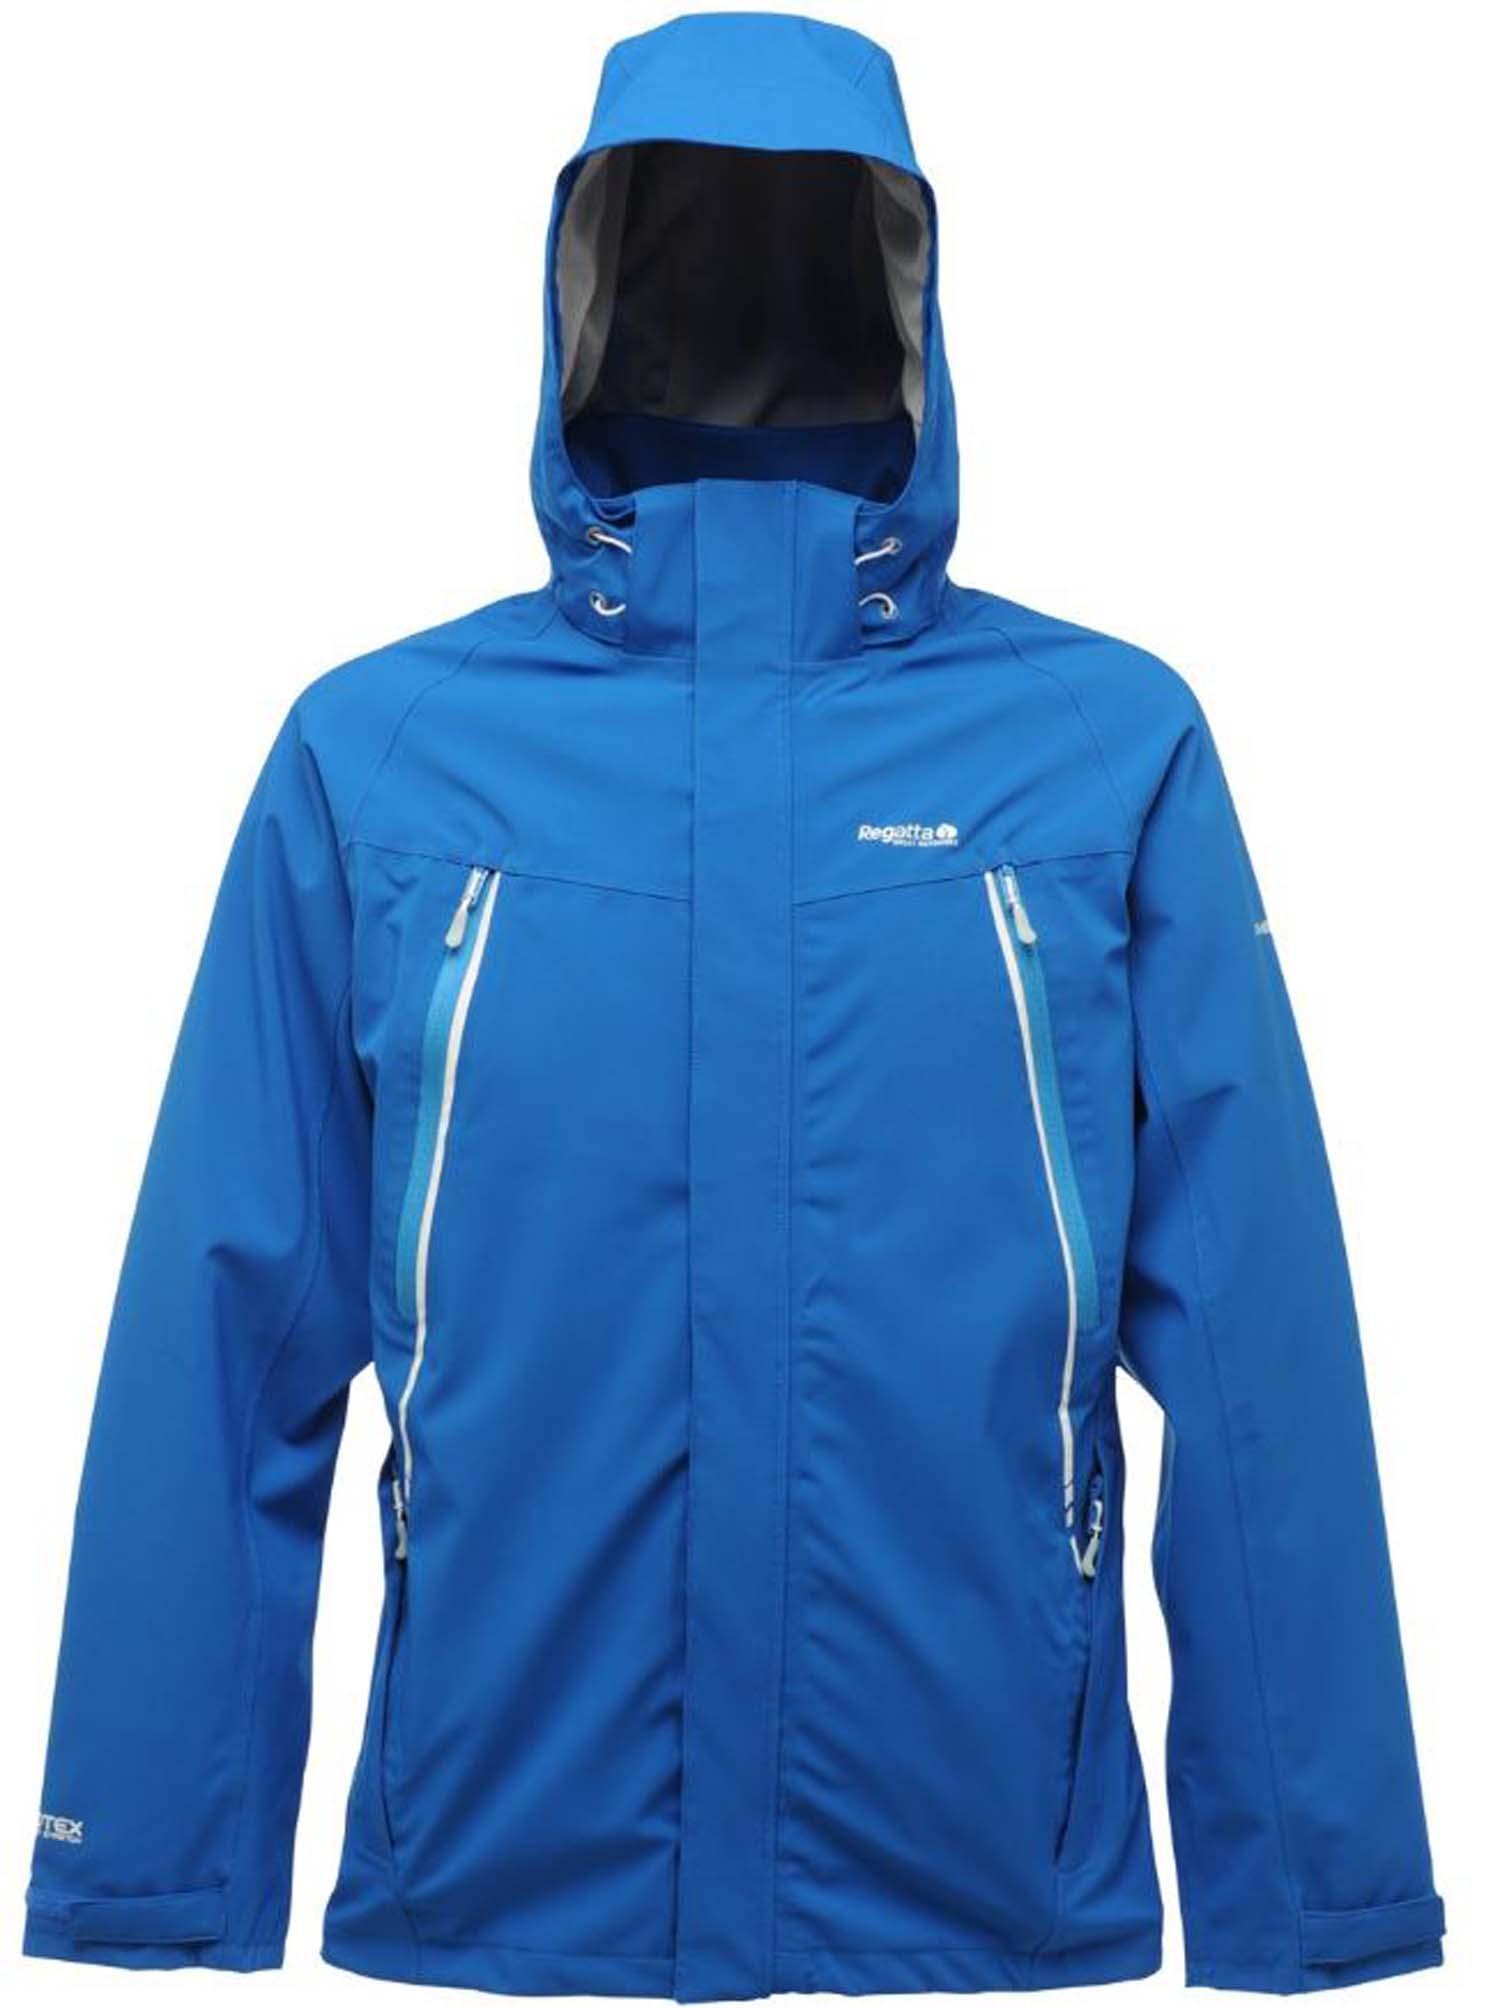 Mens regatta jacket - Regatta Highgate Mens Isotex 15000 Stretch Waterproof Breathable